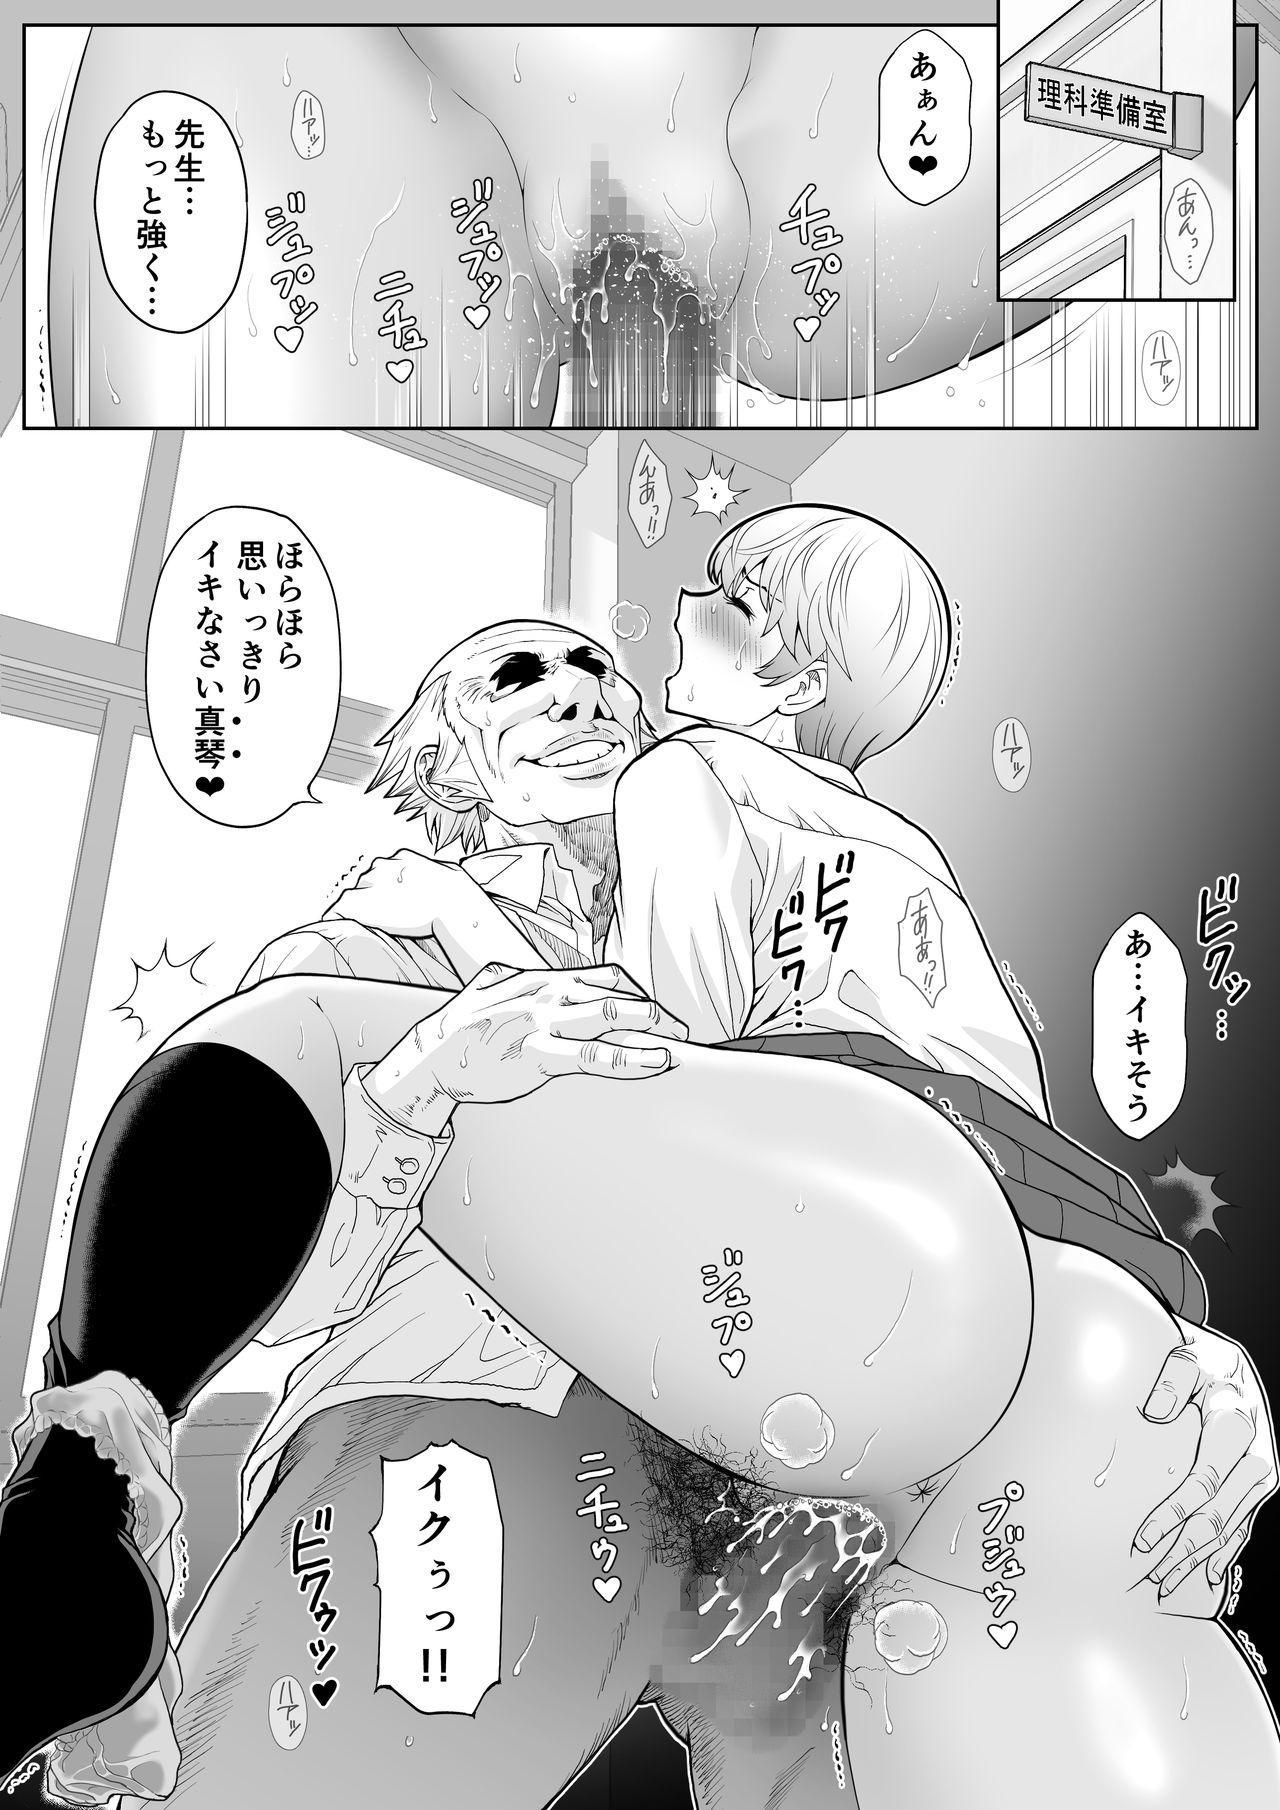 Namaiki mmusume ni tsuyo ● ikīki jugyō 83